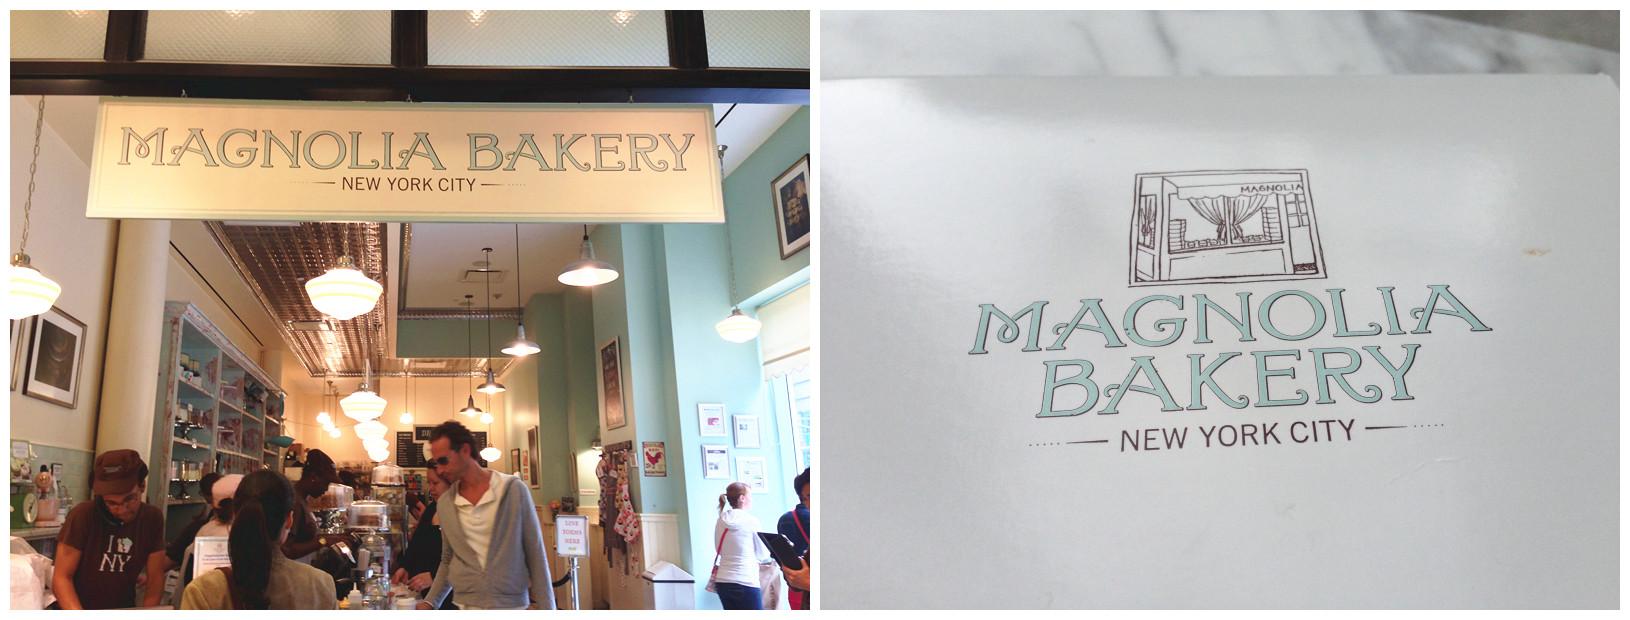 Magnolia Bakery风靡全城的杯子蛋糕_图1-2